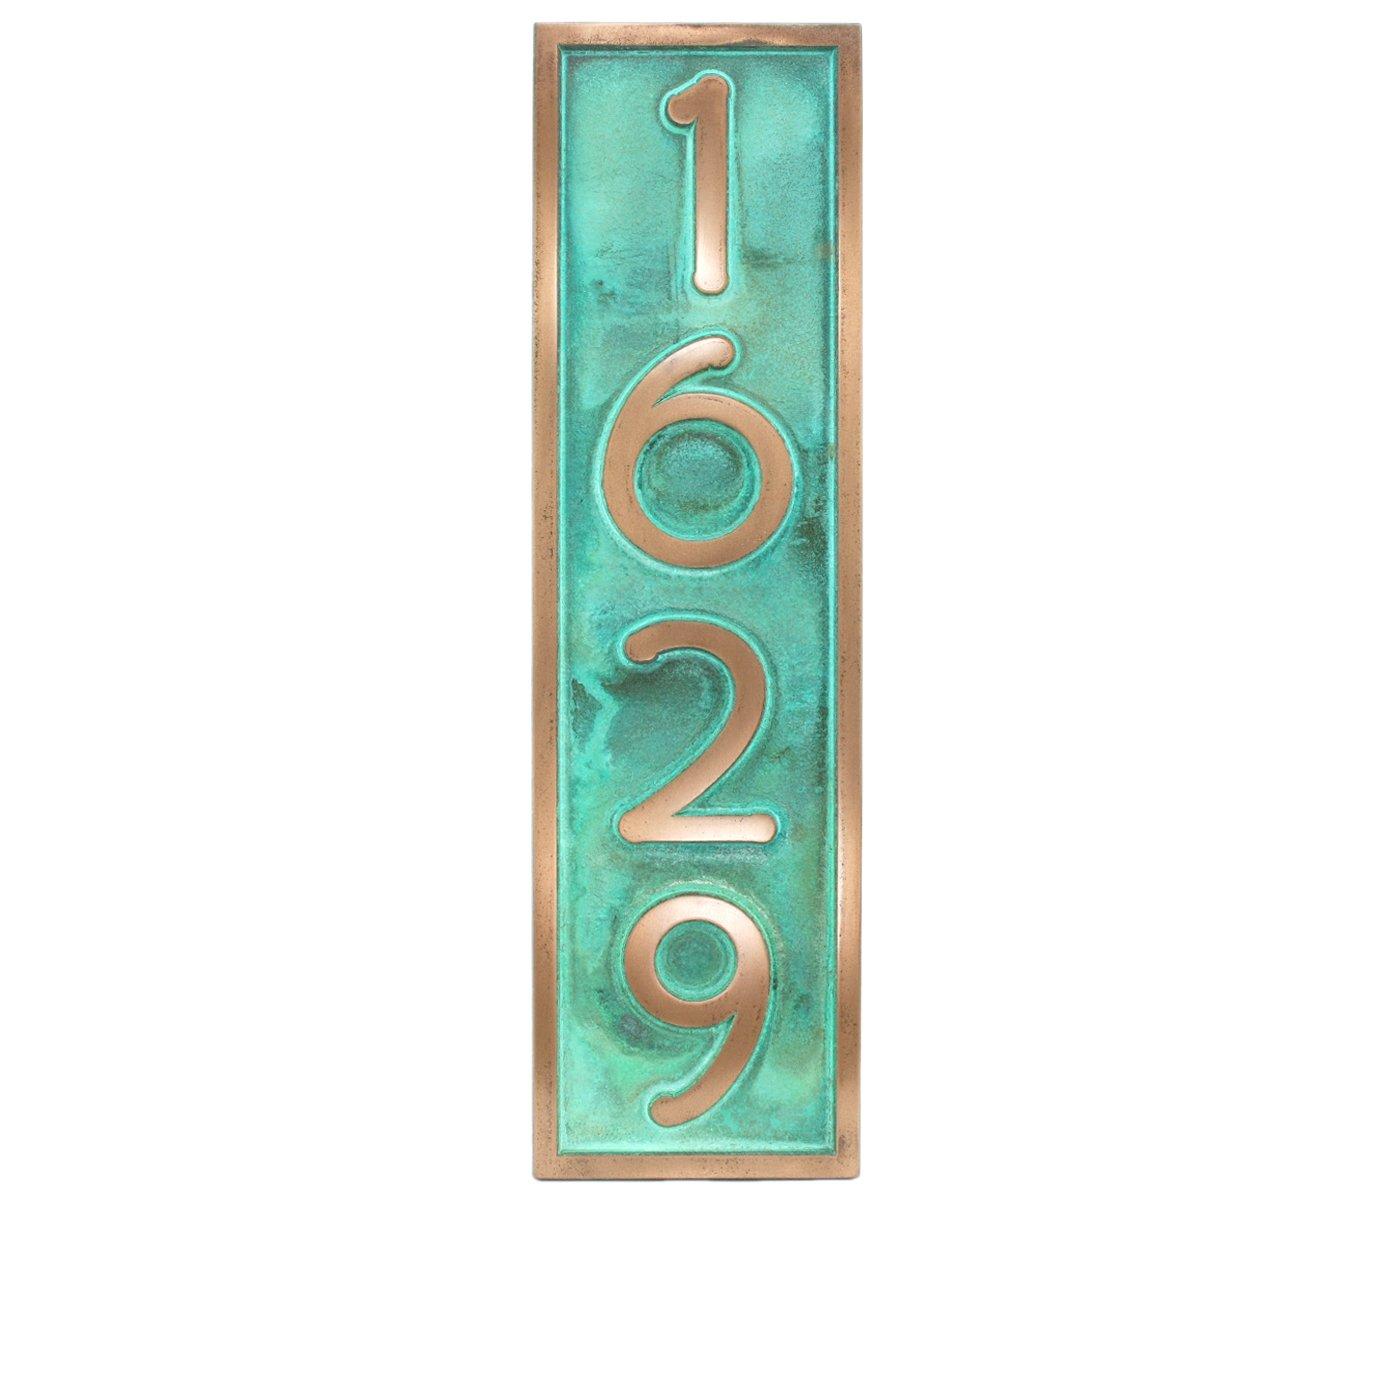 Frank Lloyd Handcrafted Vertical Home Number Plaque 6.5x23 - Raised Bronze Verdi Metal Coated